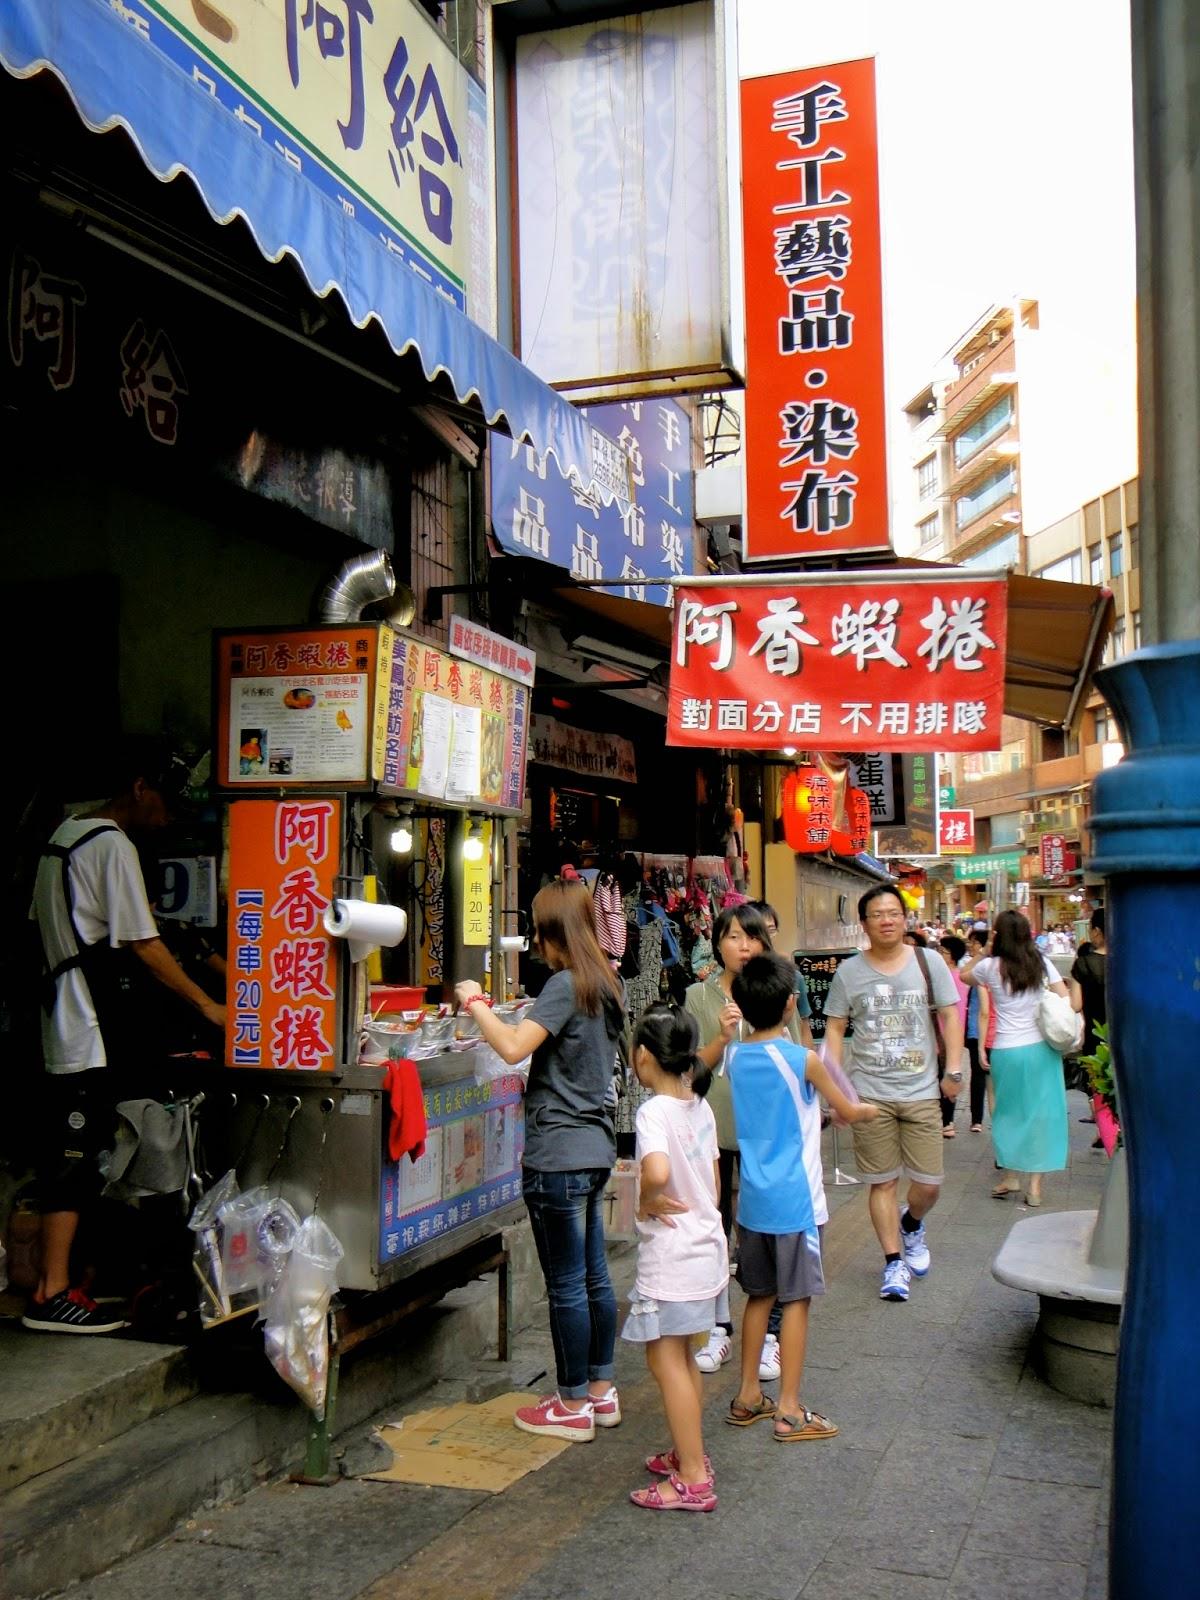 Fried Gyoza Stall at Tamsui Old Street Taiwan